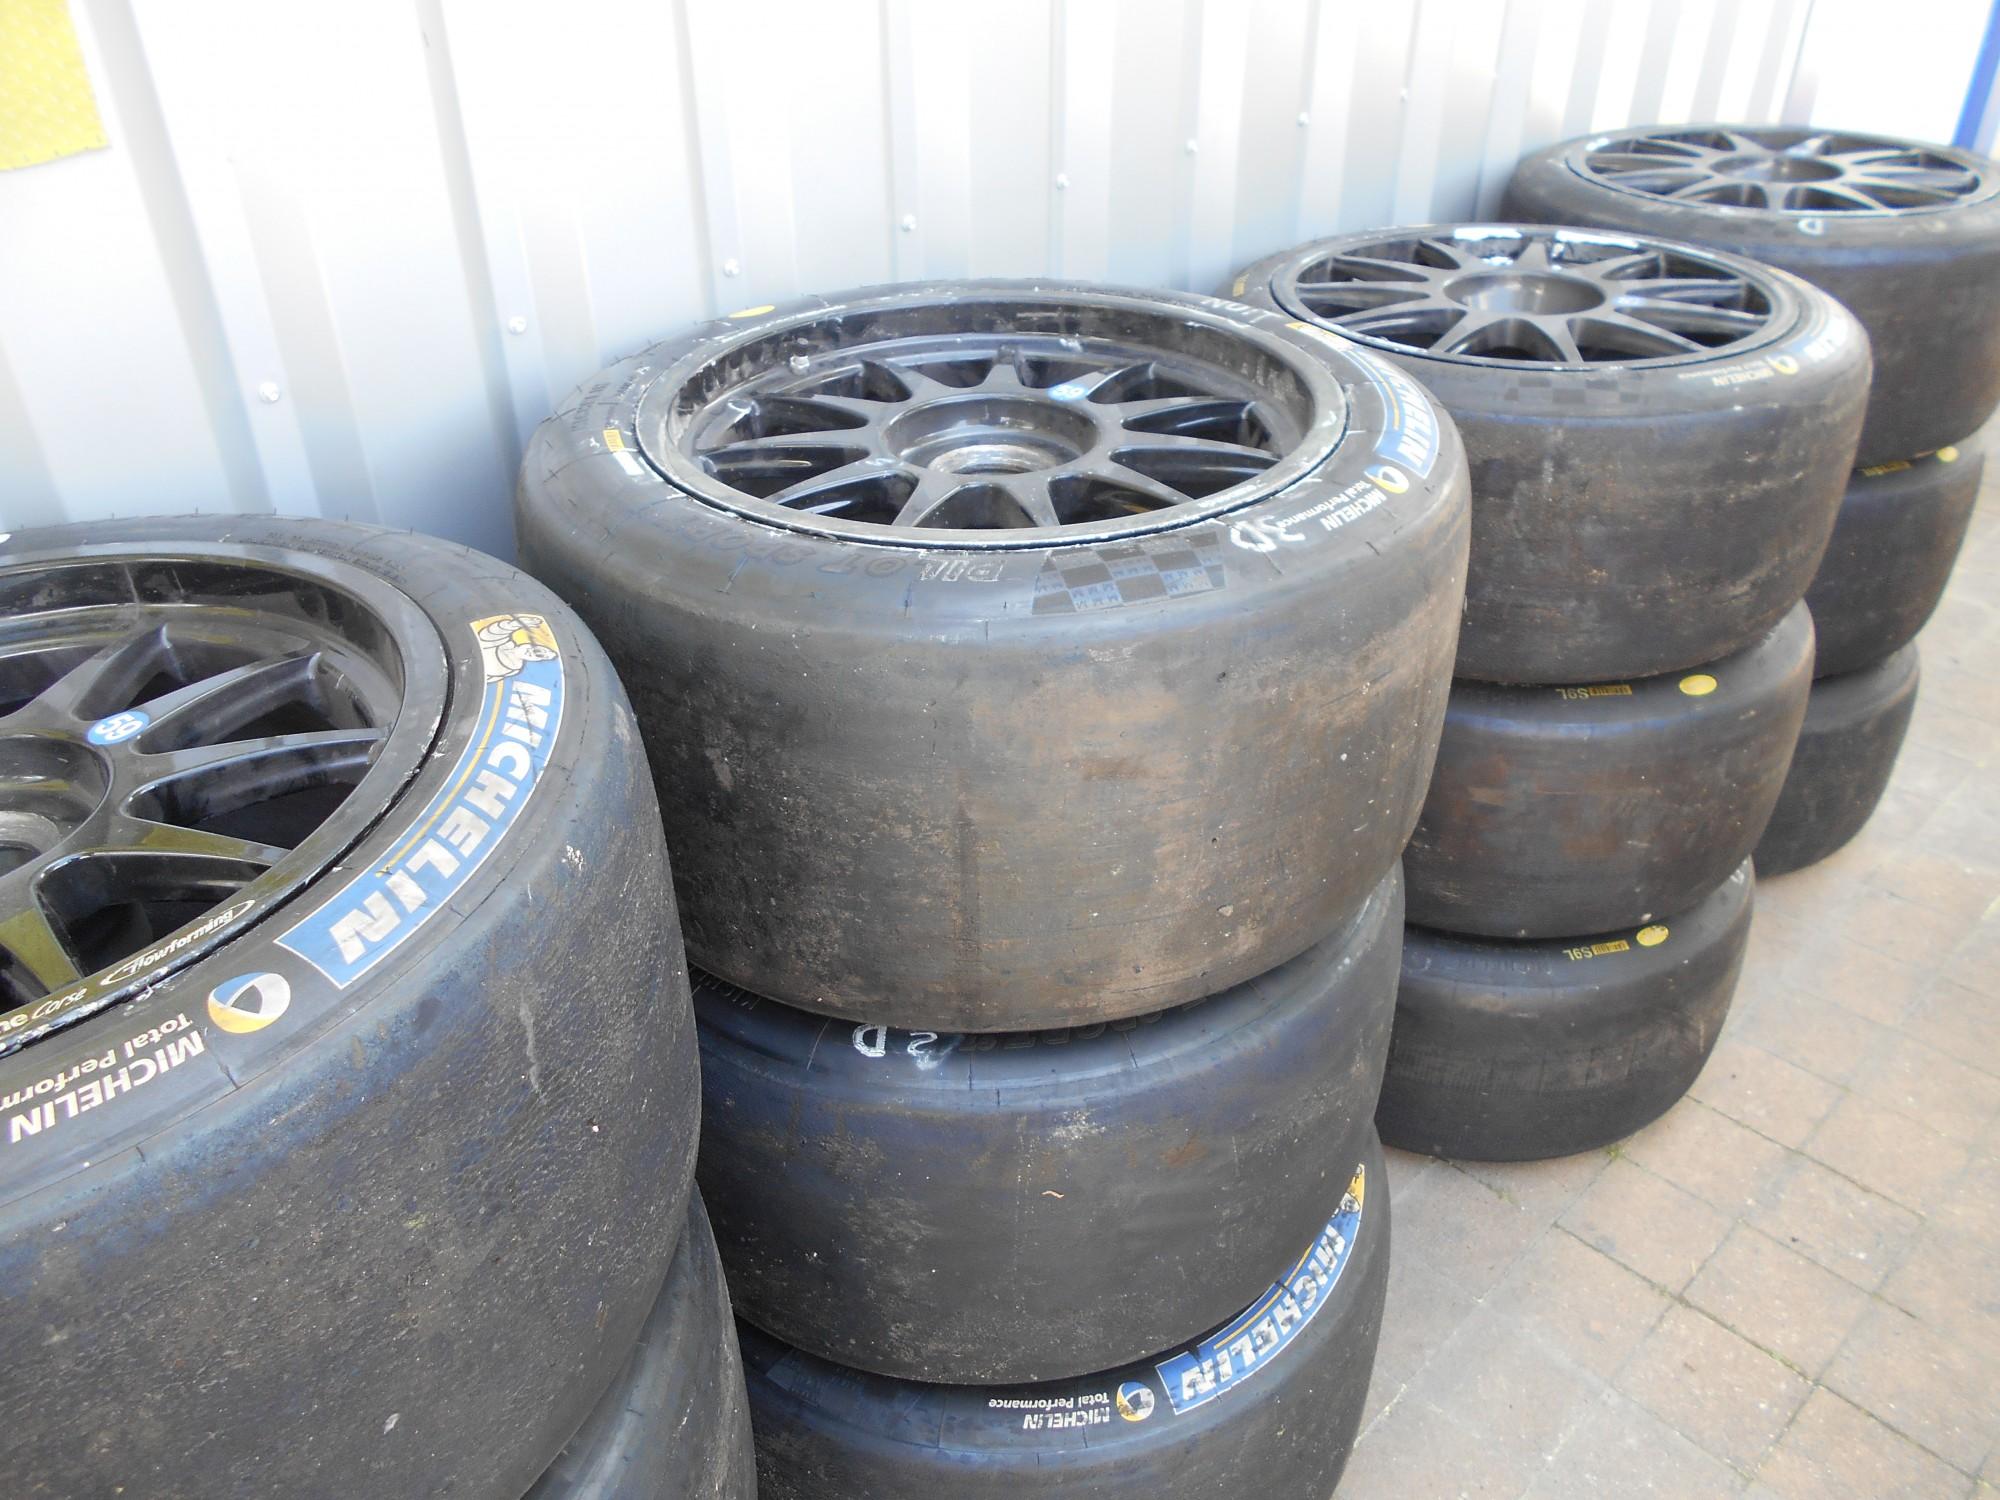 vente de pneu sport montpellier vente de pneus neufs et. Black Bedroom Furniture Sets. Home Design Ideas